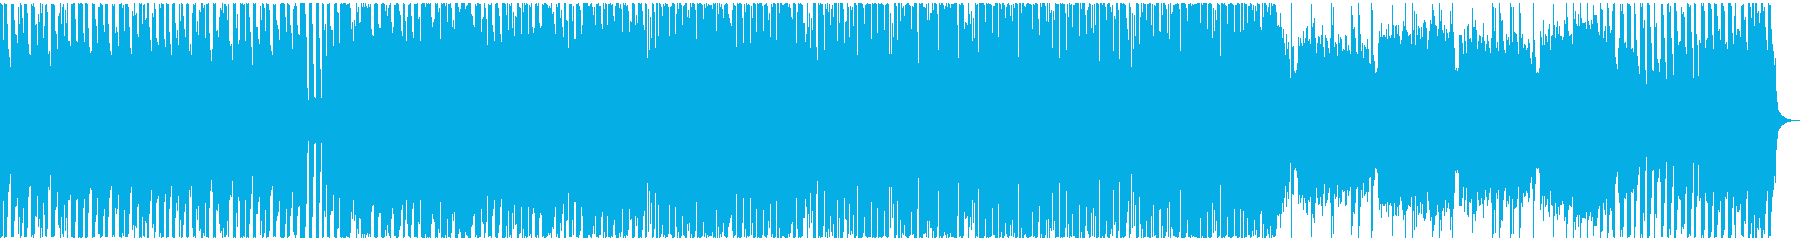 3xoscによるシンプルなテクノ の再生済みの波形